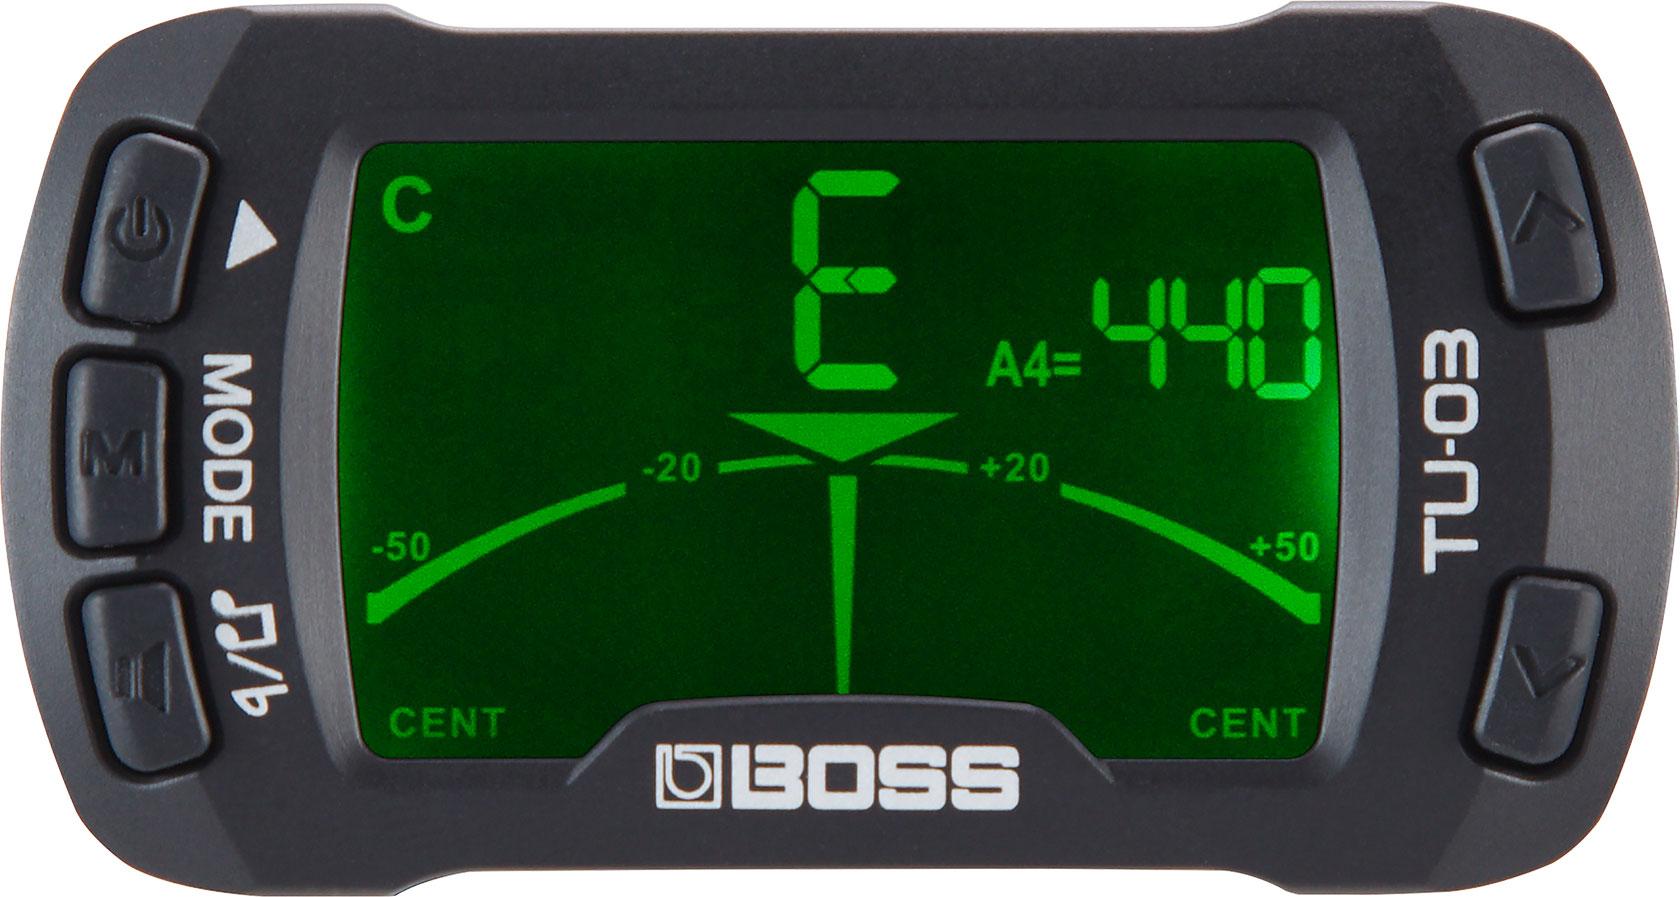 Boss TU-03 Clip-On Tuner & Metronome